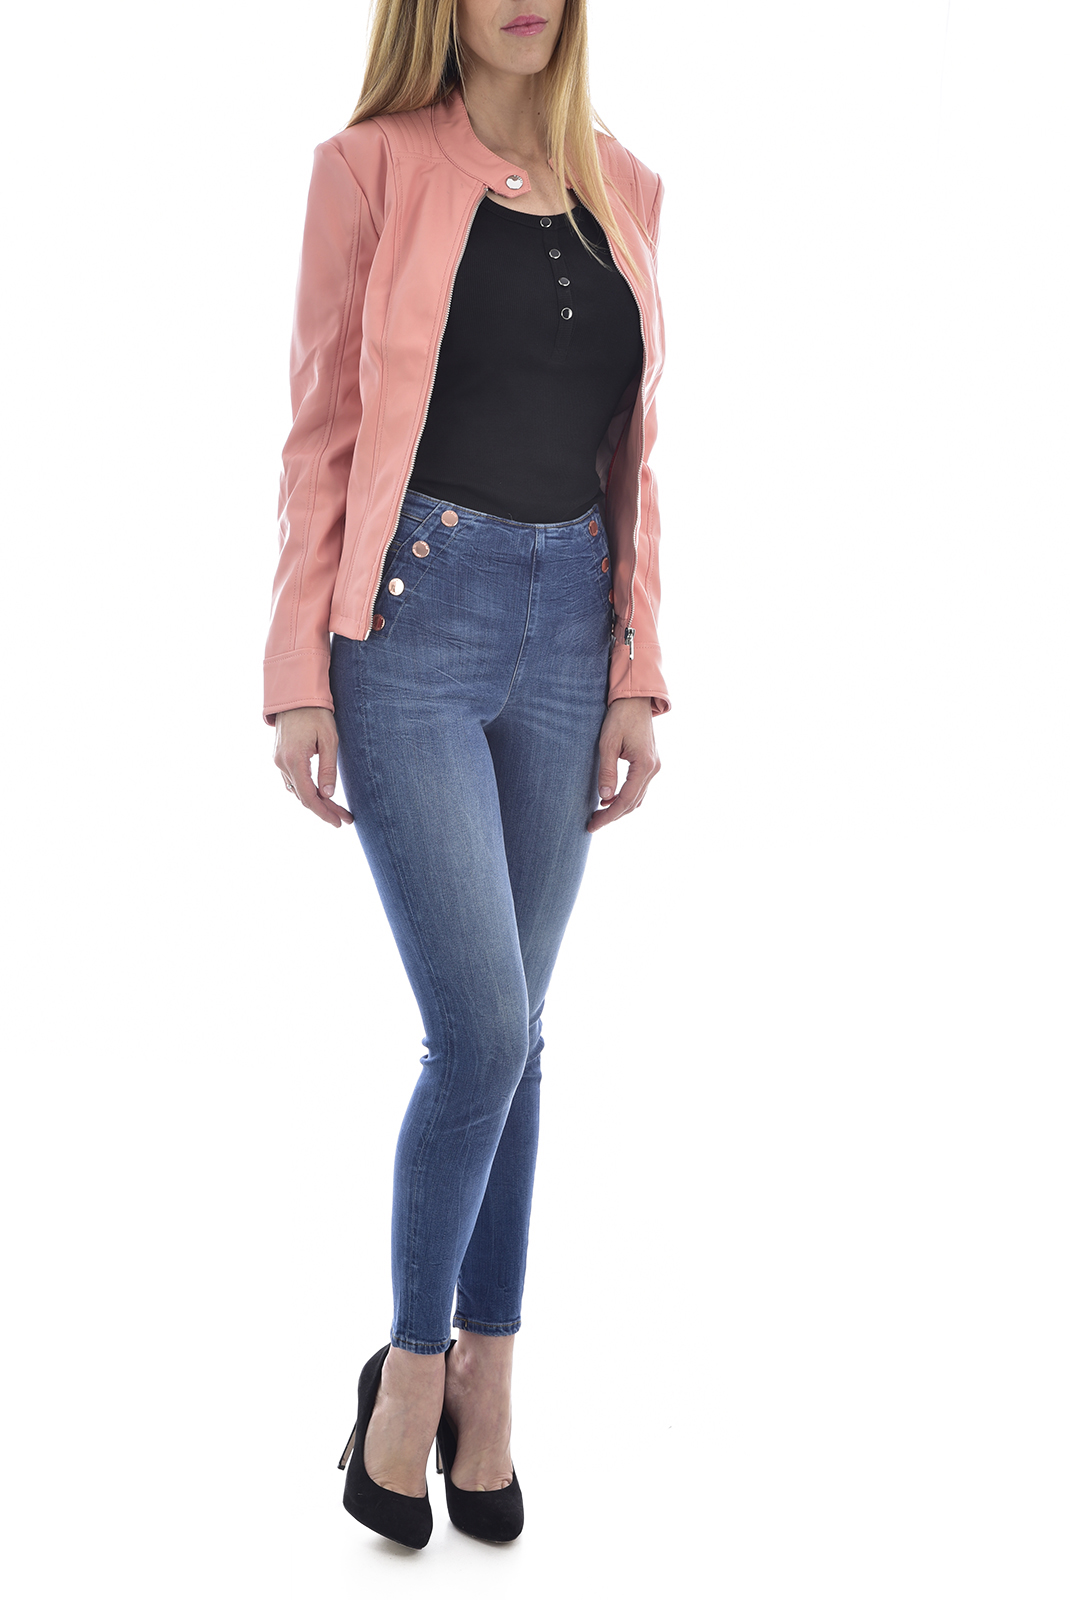 Vestes & blousons  Guess jeans W02L20 WAEI0 TAMMY G60ESUNRISE BLISS